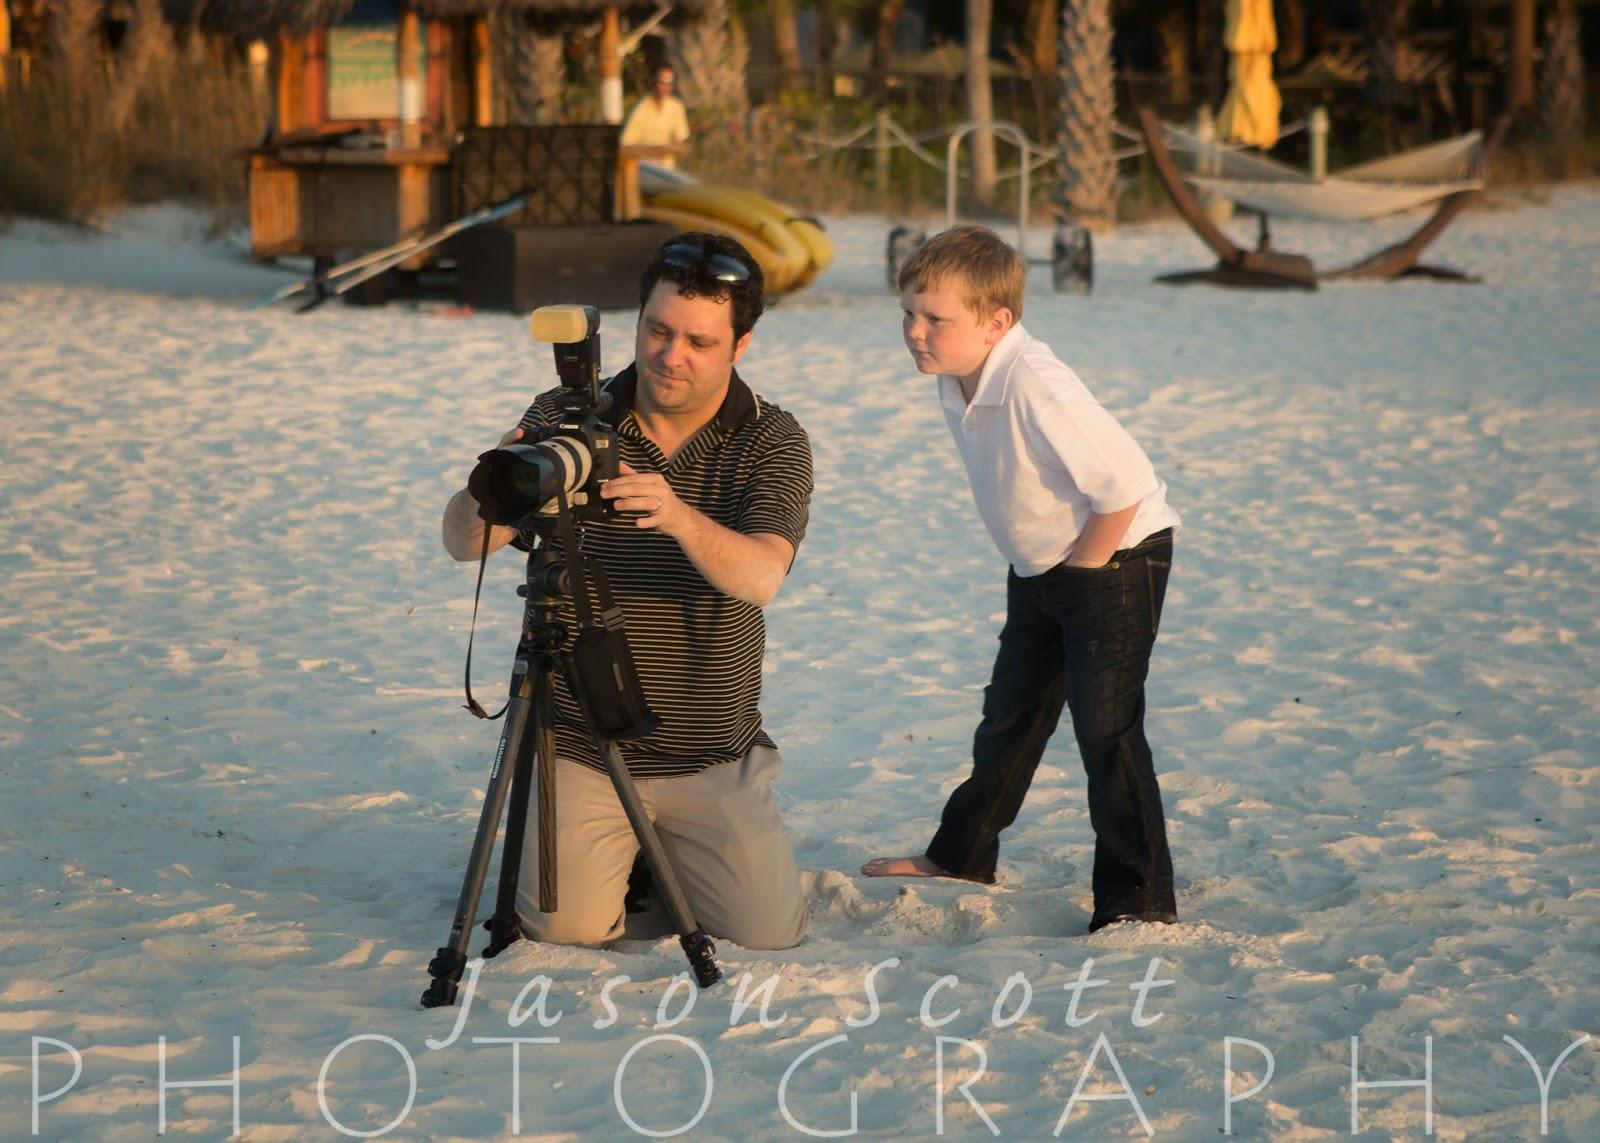 Jason Scott Photography: Beach Portrait FAQ